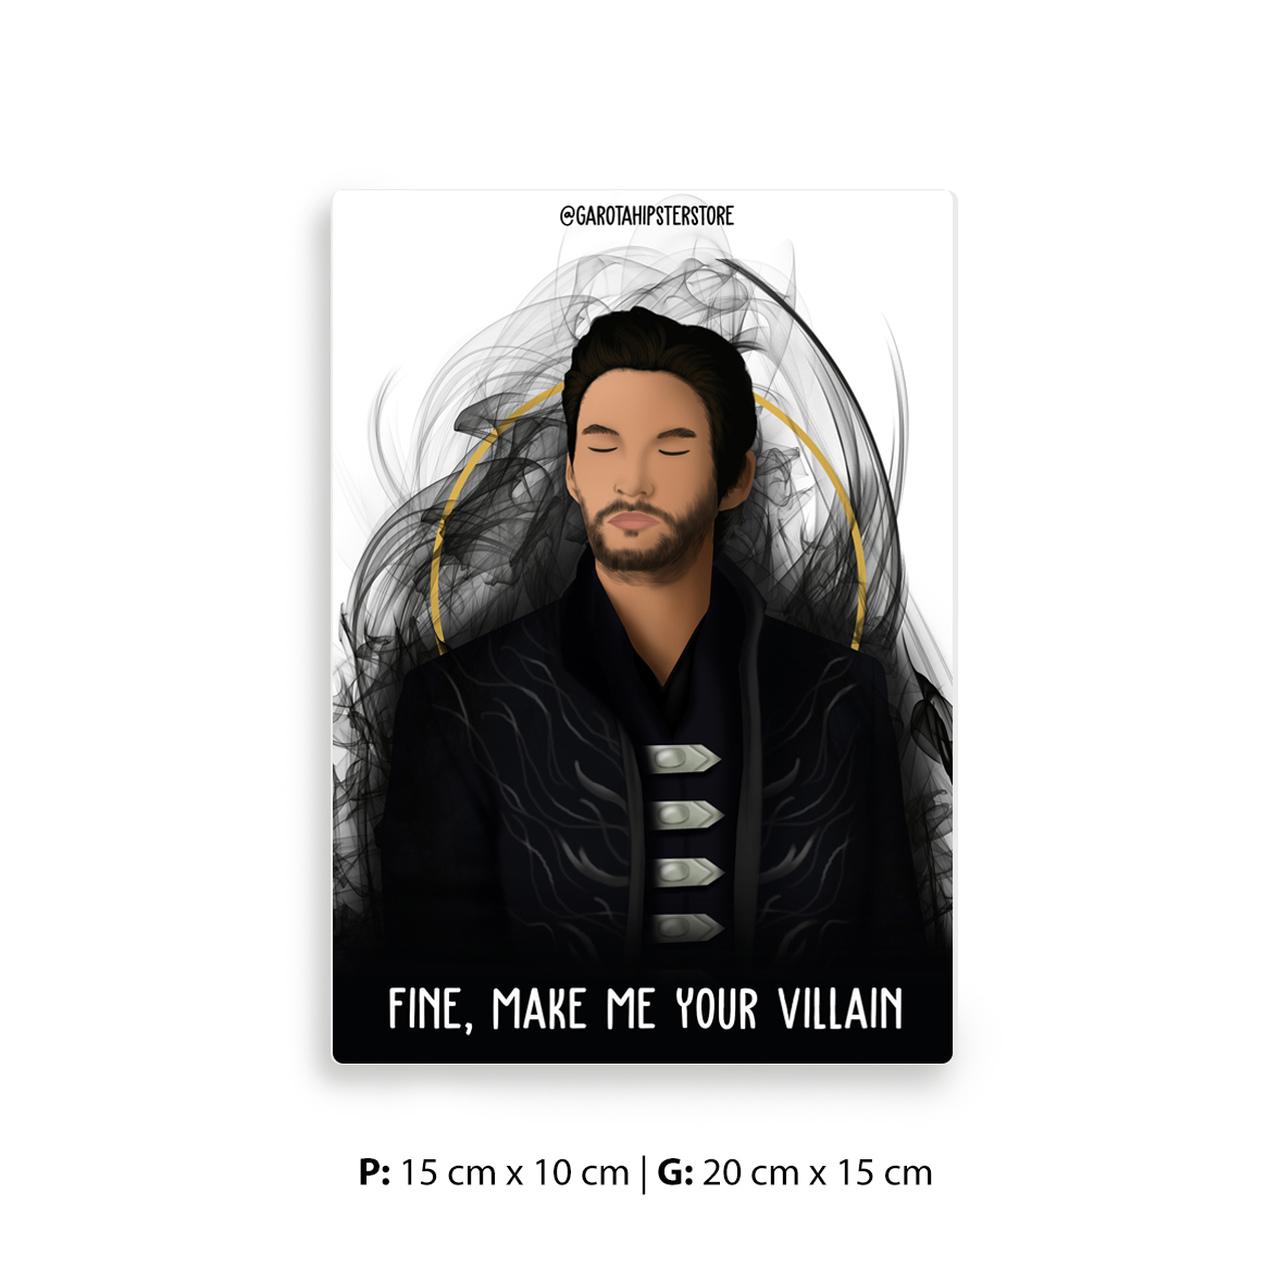 Placa Decorativa Sombra / Make Me Your Villain